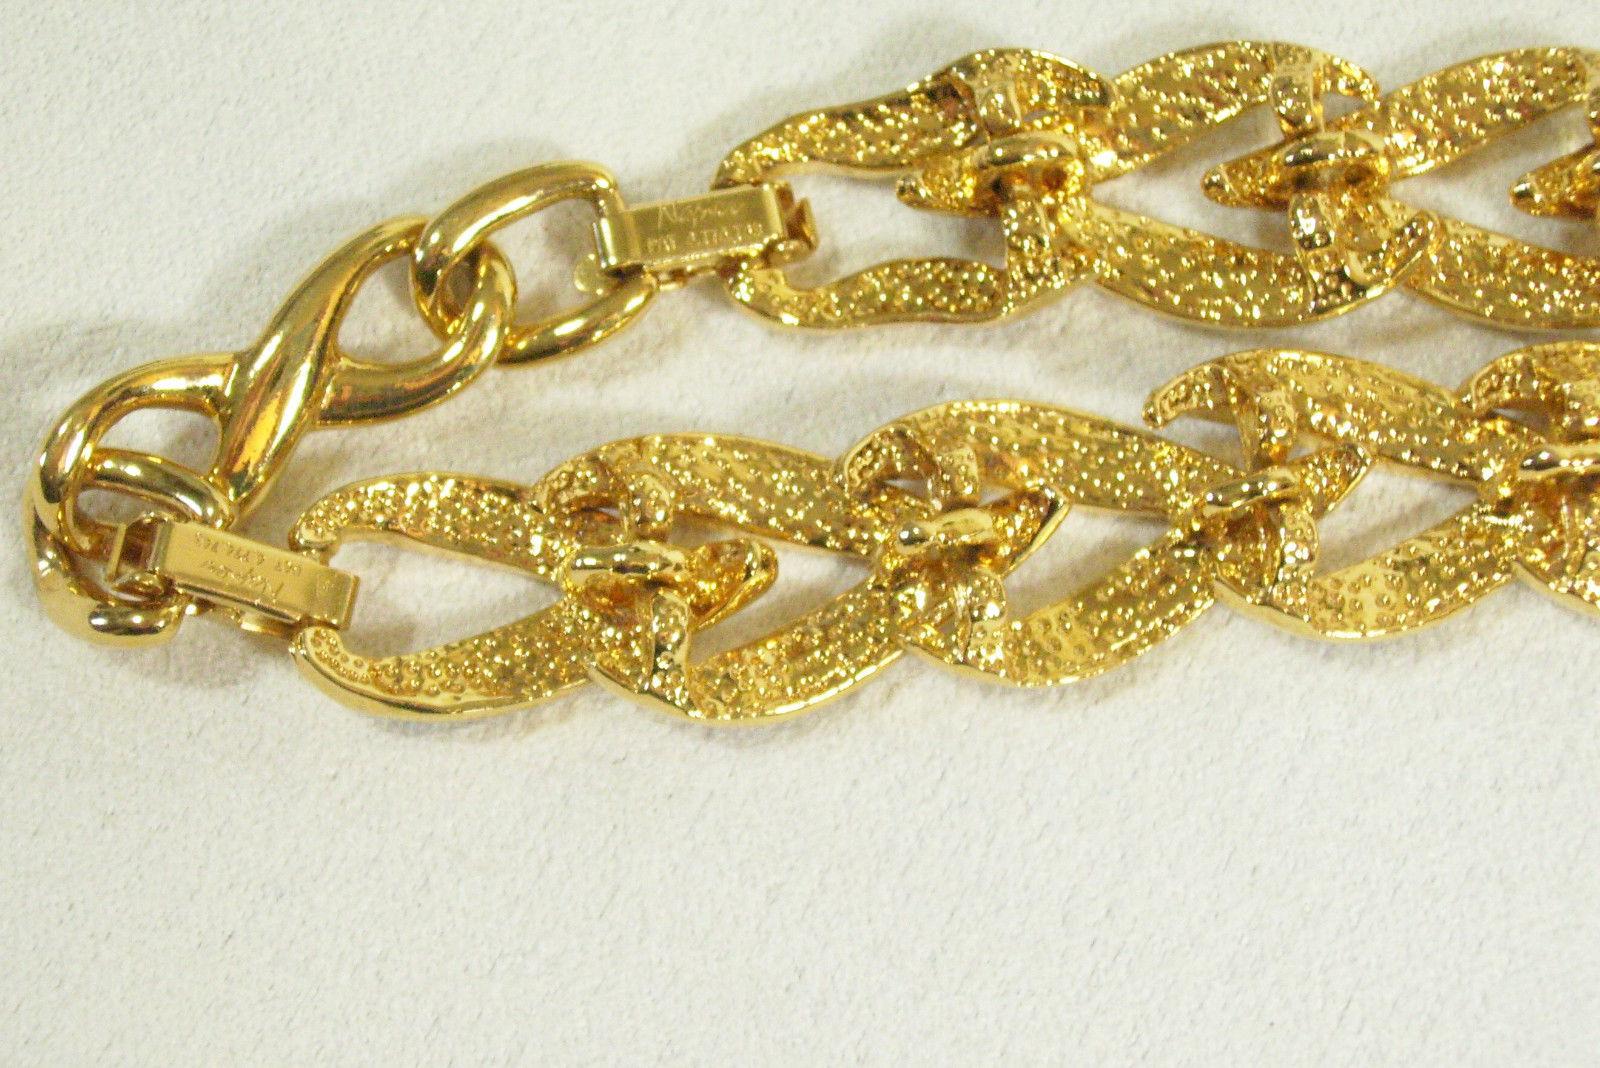 NAPIER Gold Plated BLACK Enamel CURB Link Chain Choker Necklace Extension Vintg